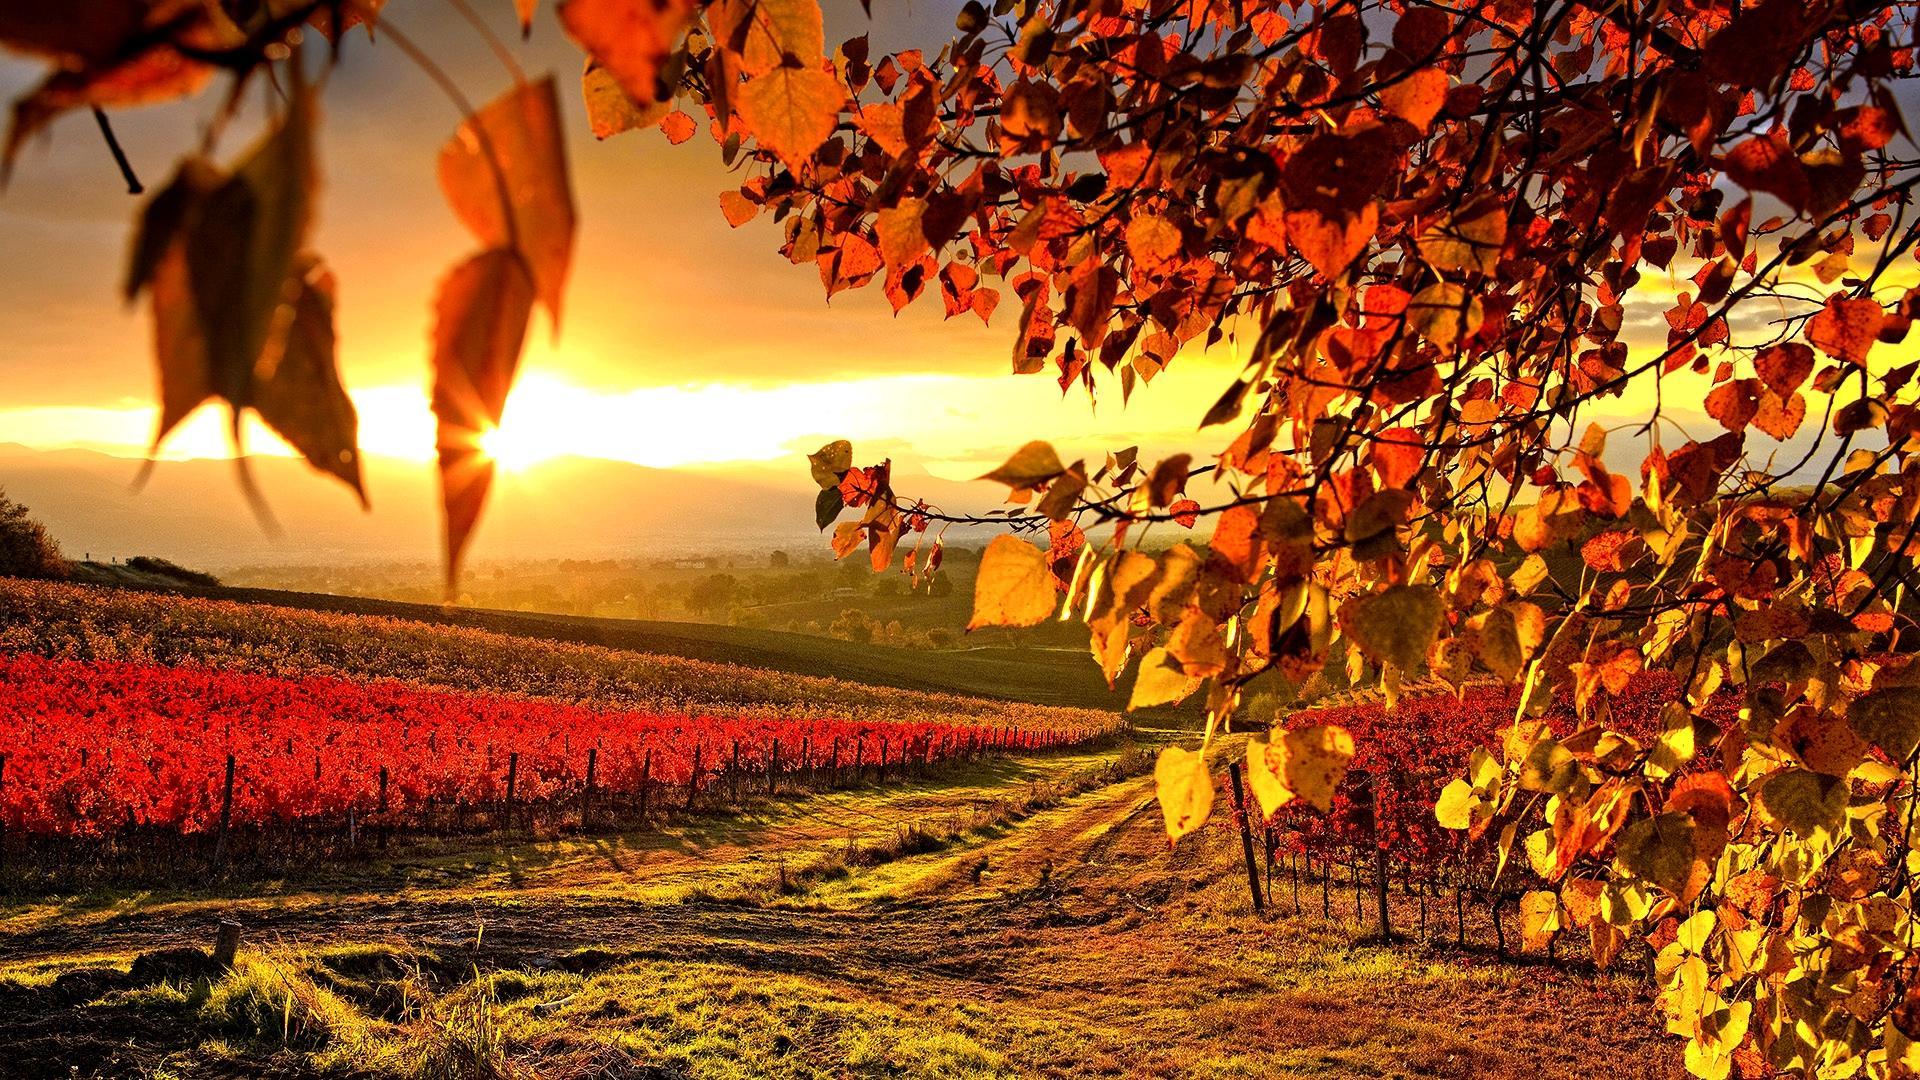 Beautiful Autumn Hd Wallpapers 1920x1080 Wallpapersafari